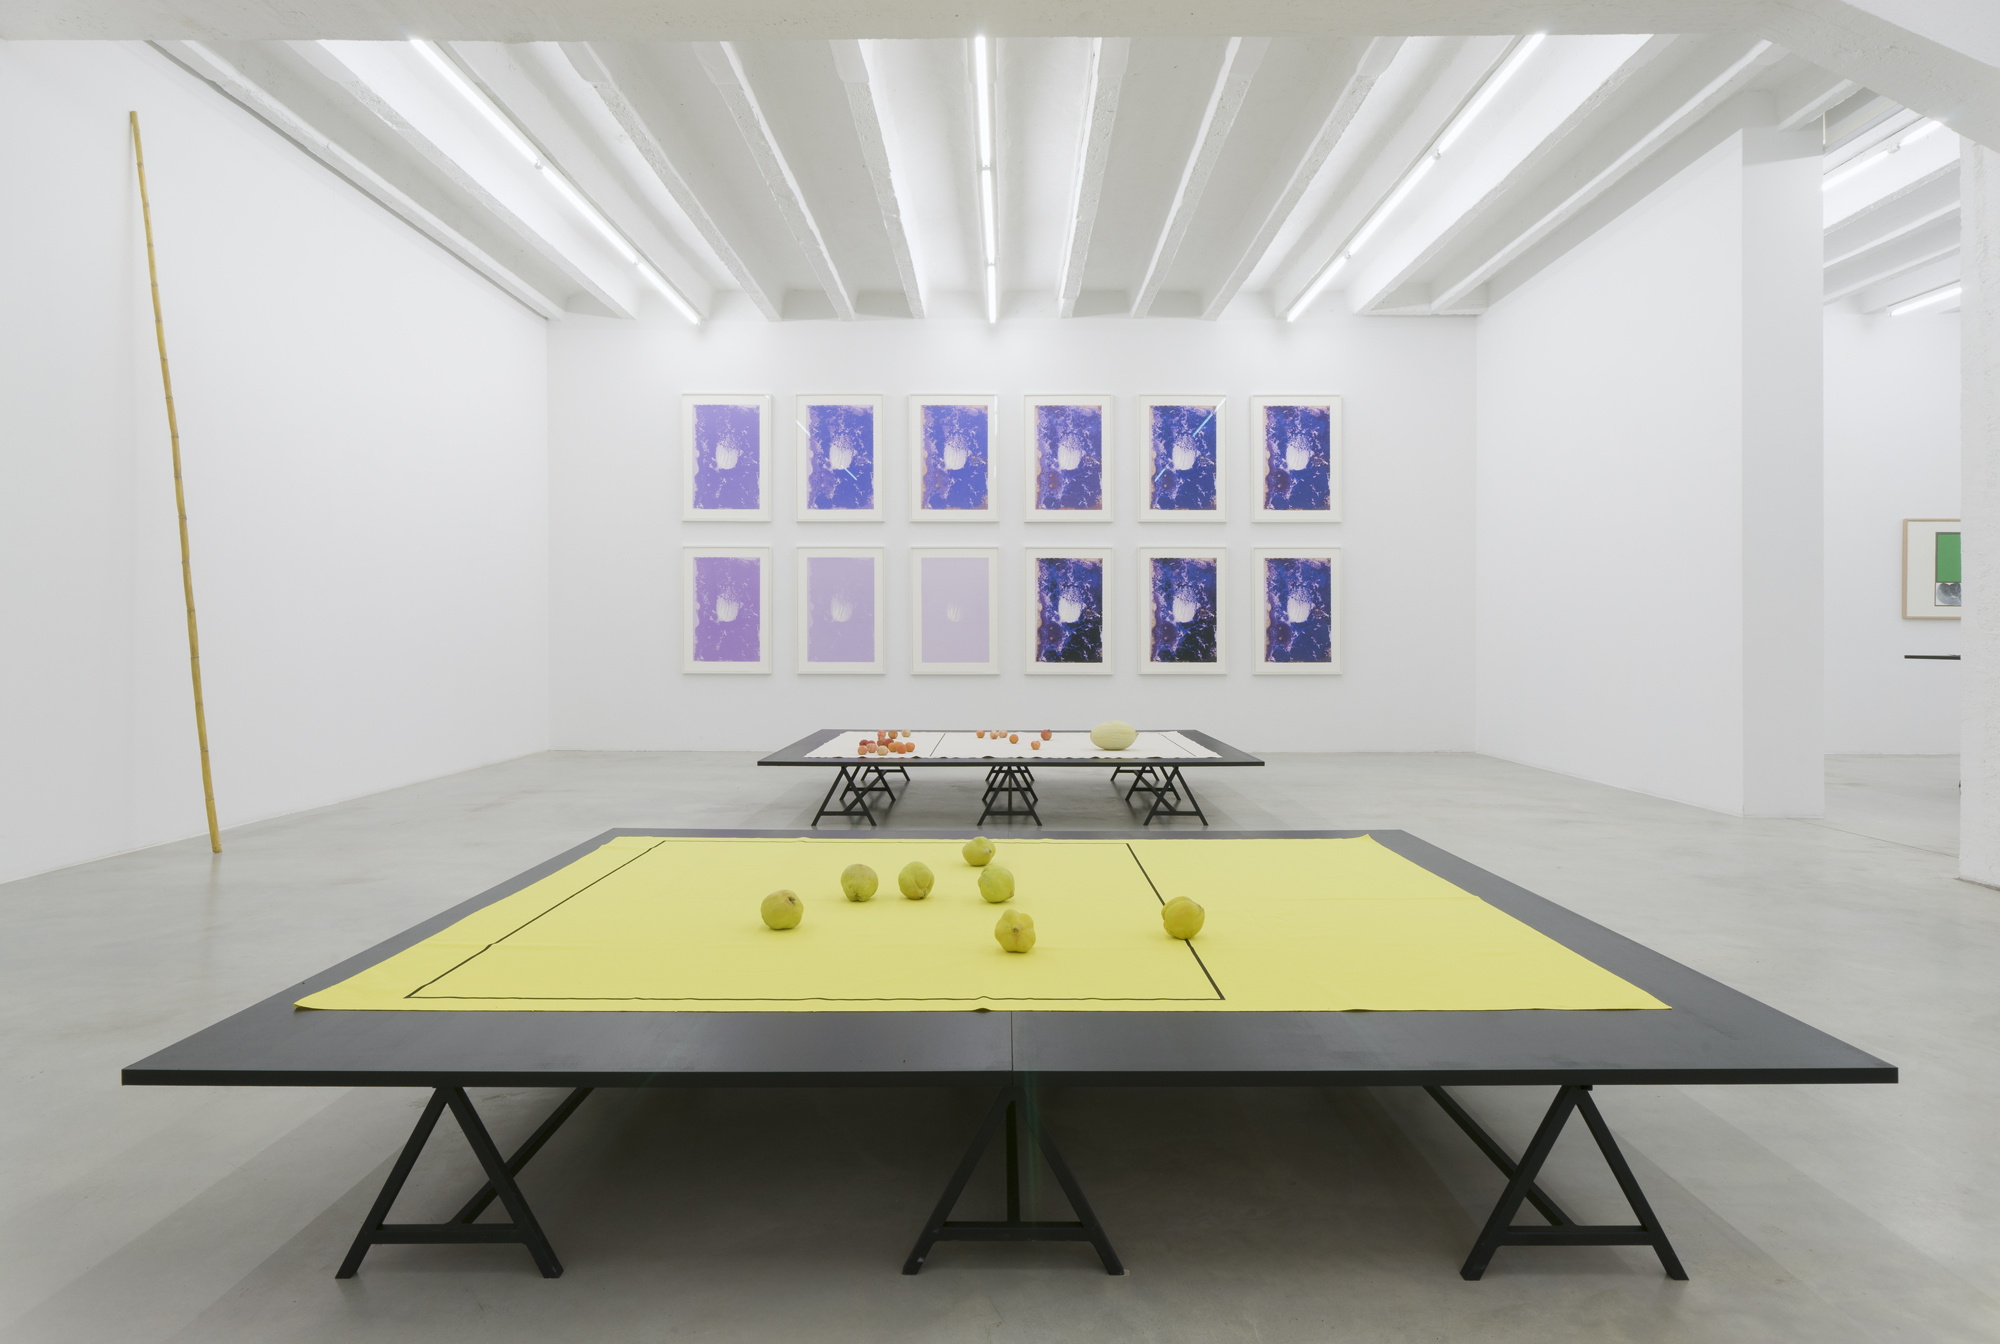 Francisco Tropa: Noche Triste, exhibition view, Galerija Gregor Podnar, Berlin, 2015. Photo: Marcus Schneider